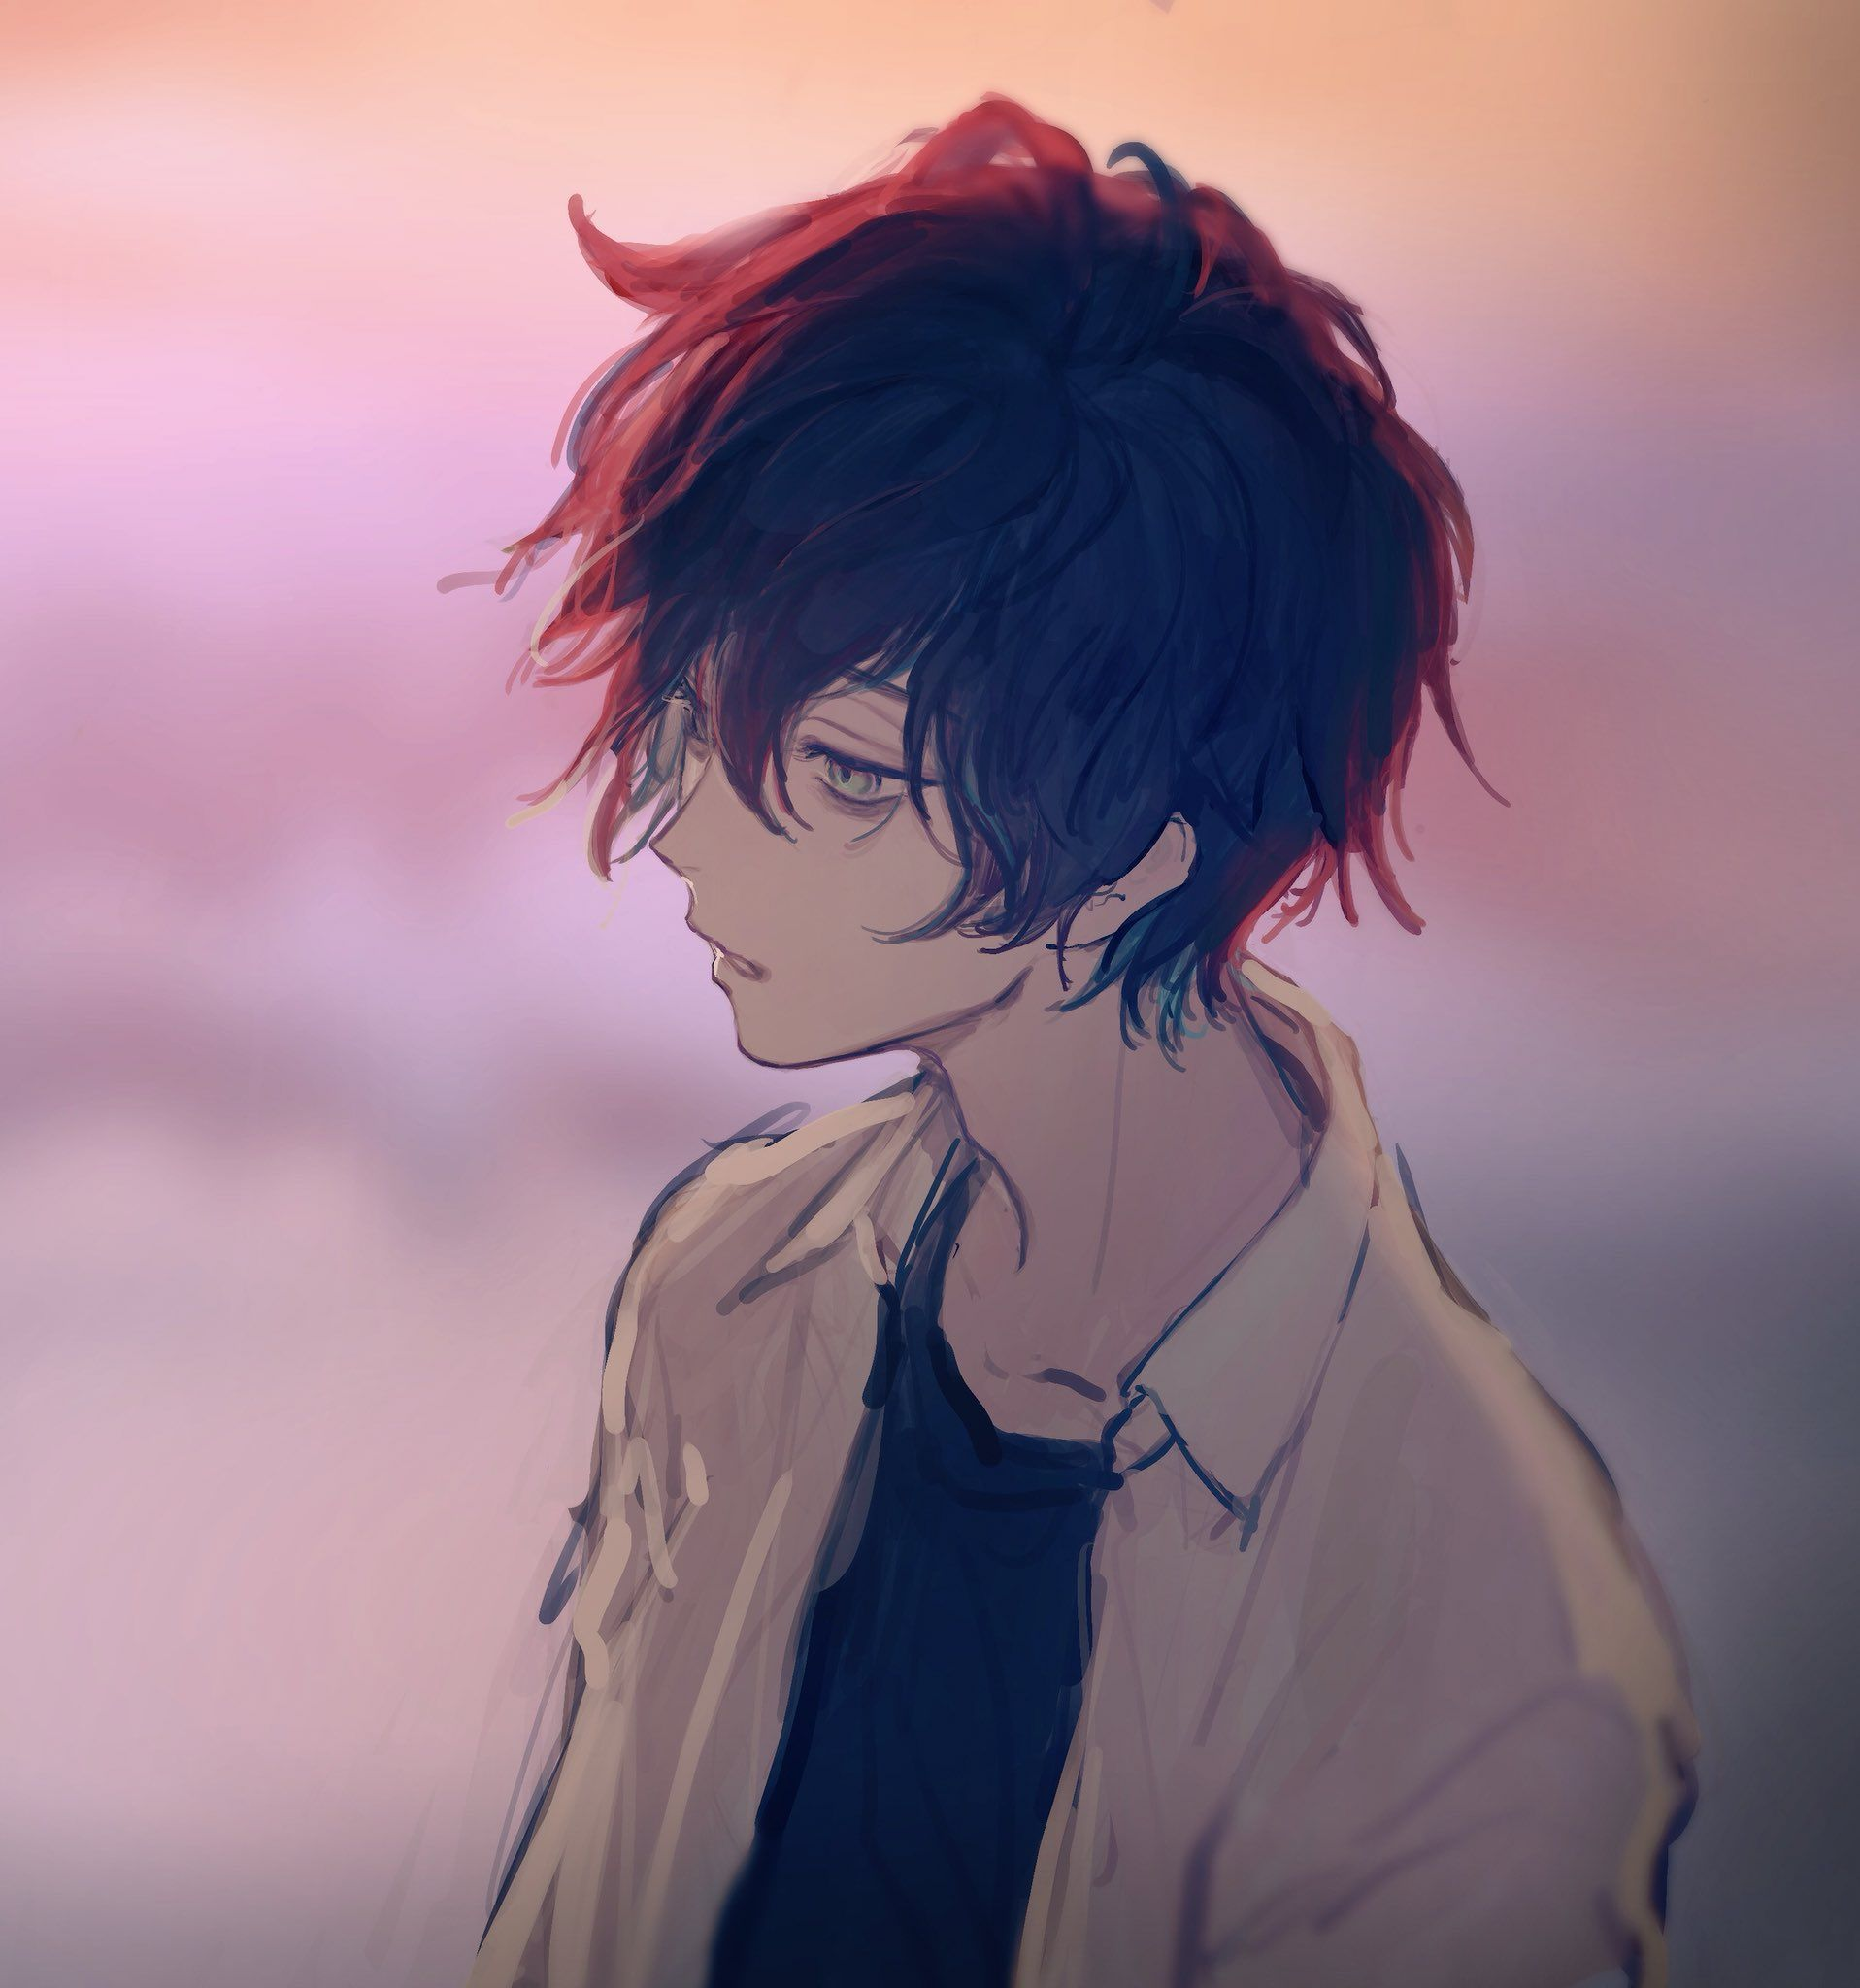 Pin by Maria on Boys and Kun Cute anime guys, Cute anime